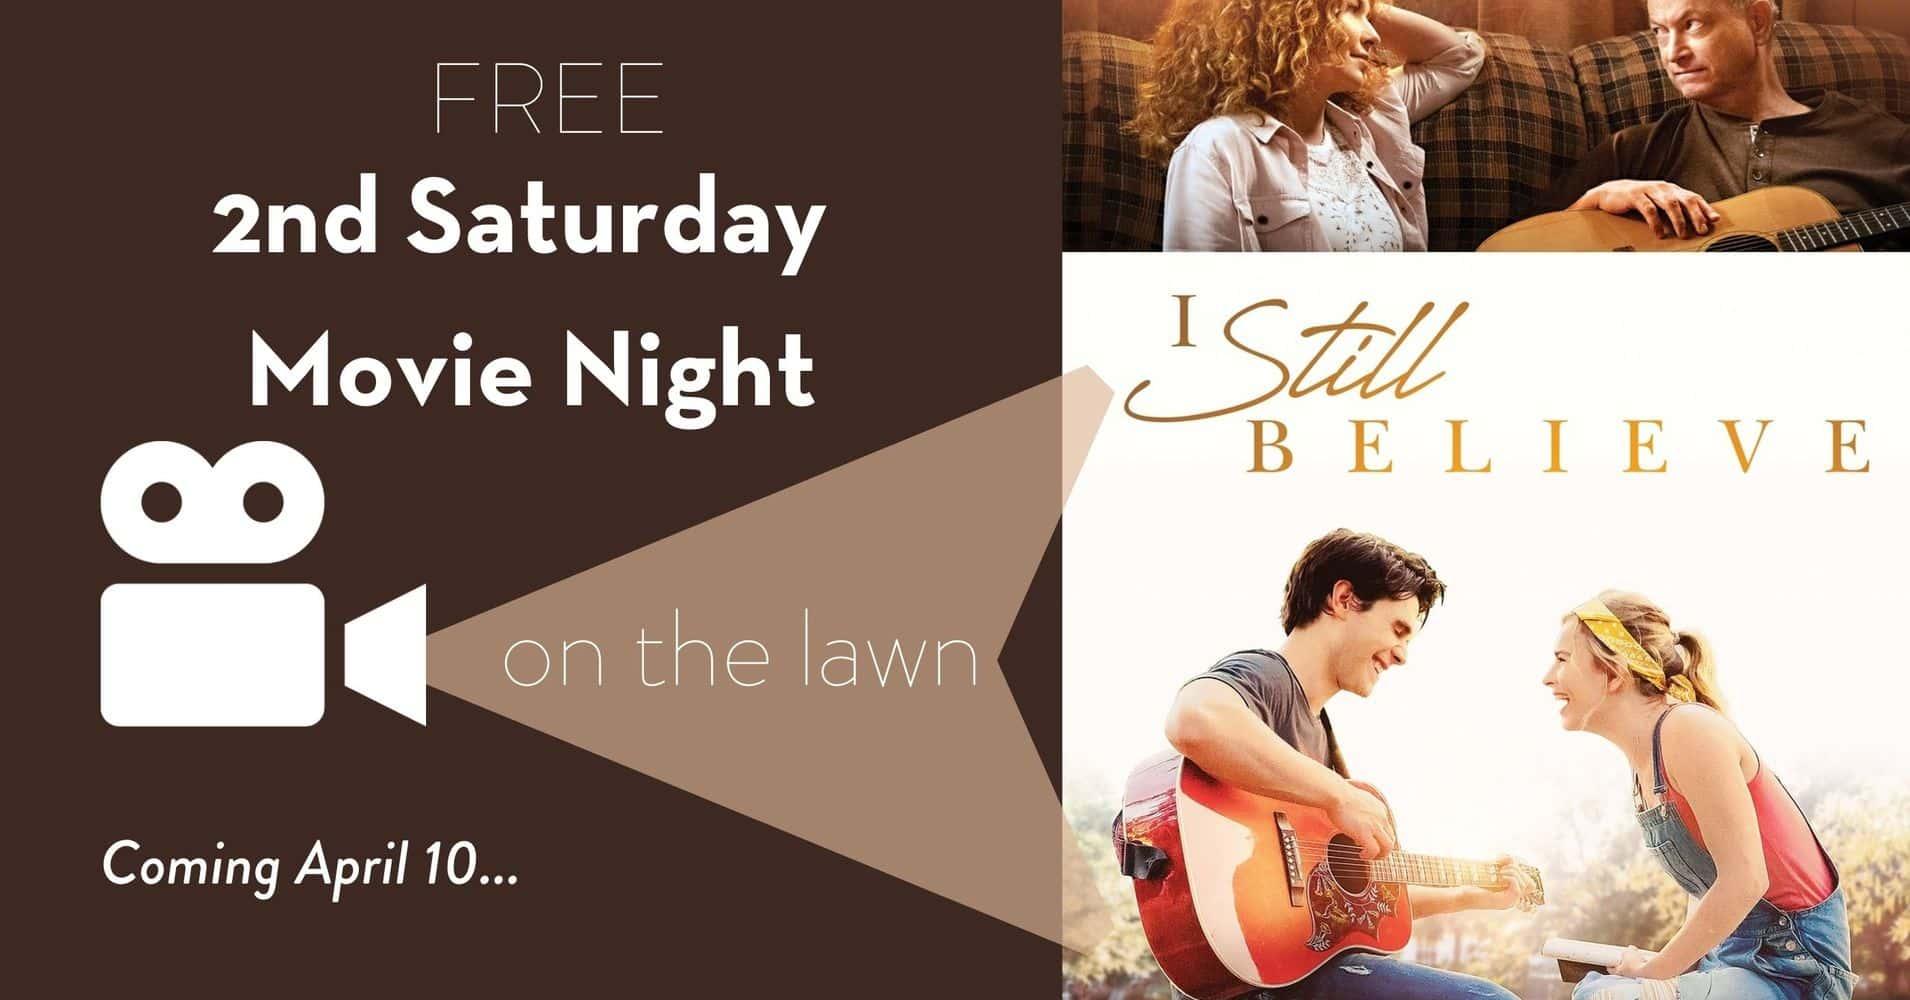 Free Movie Night - I Still Believe